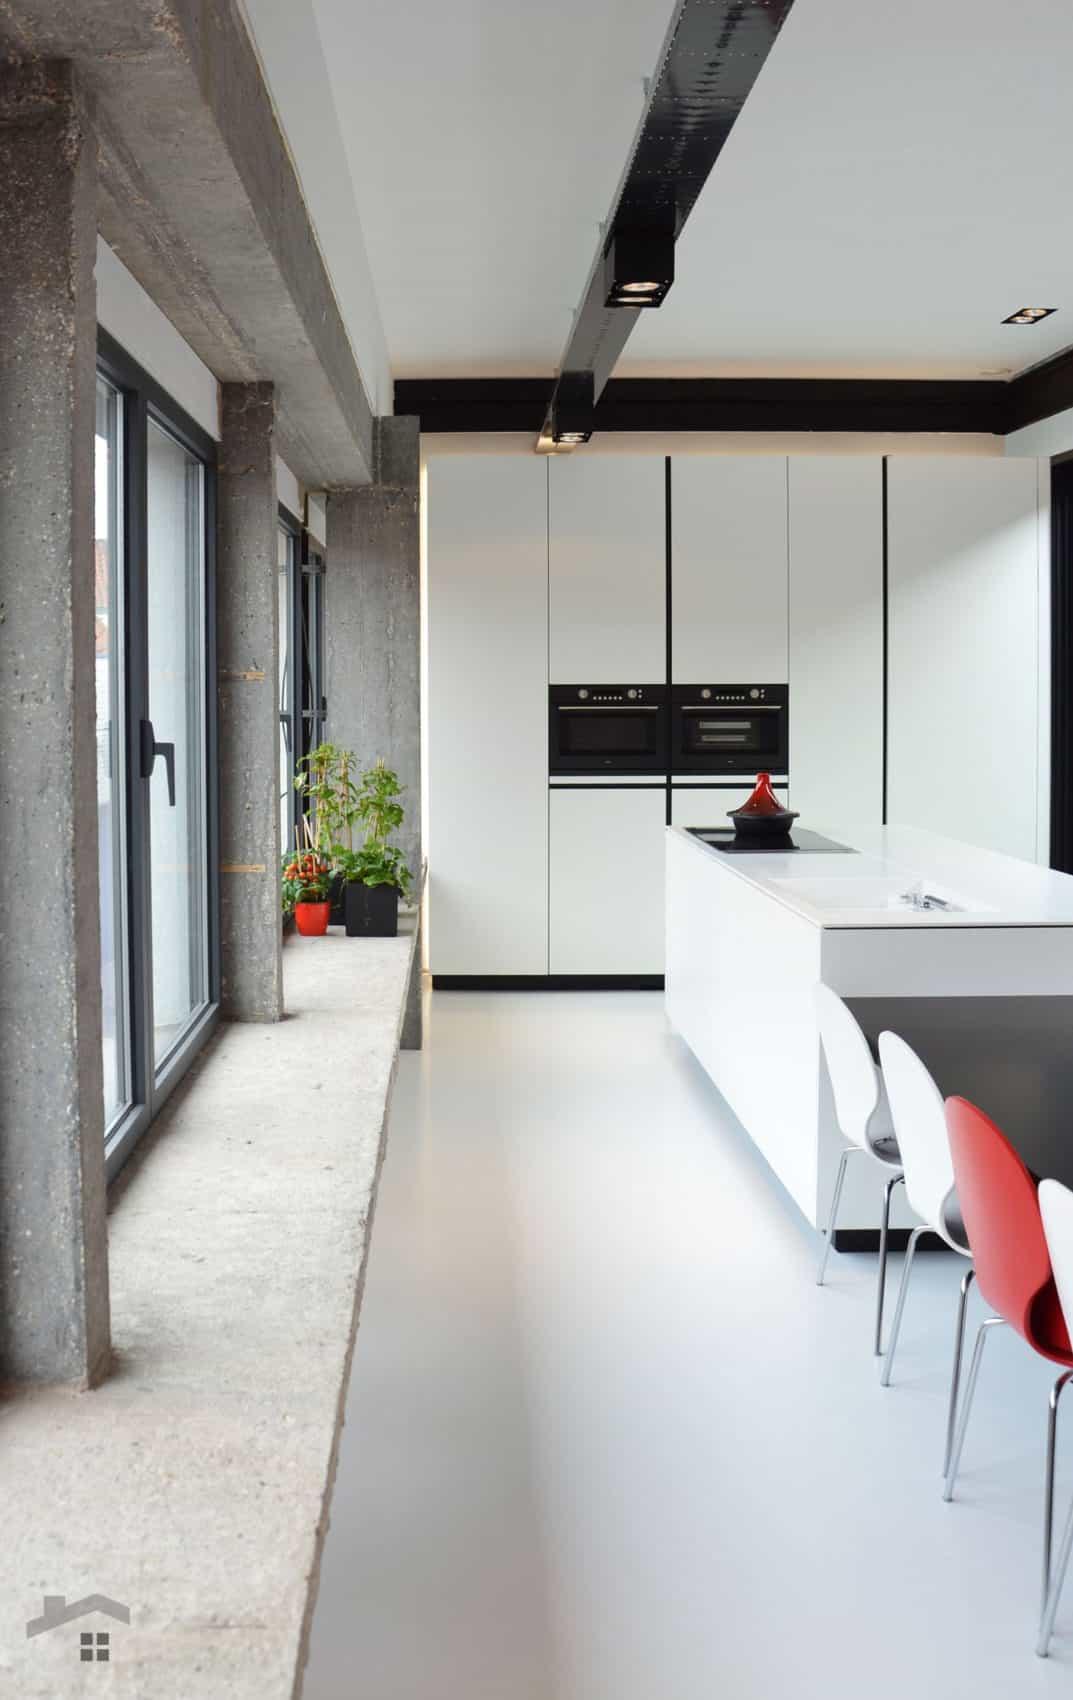 Loft 8 by Aeon Architecten (9)